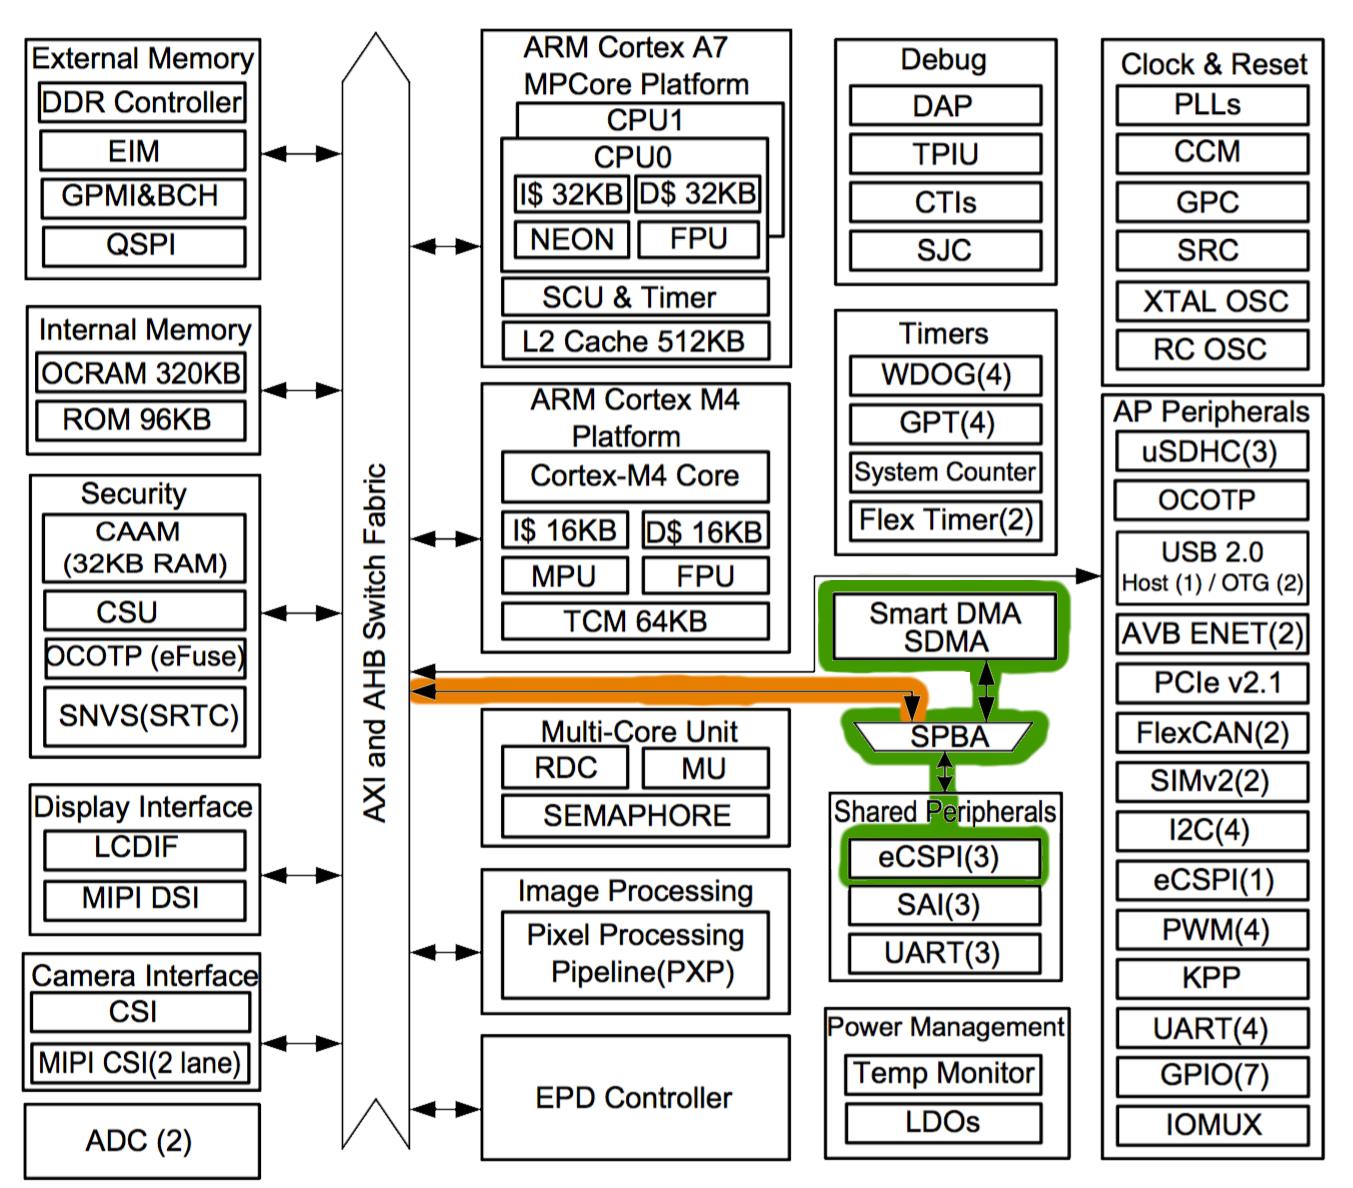 Jonahs Blog By Skrap Camera Diagram My Mx Block With Spba Sdma And Axi Highlighted